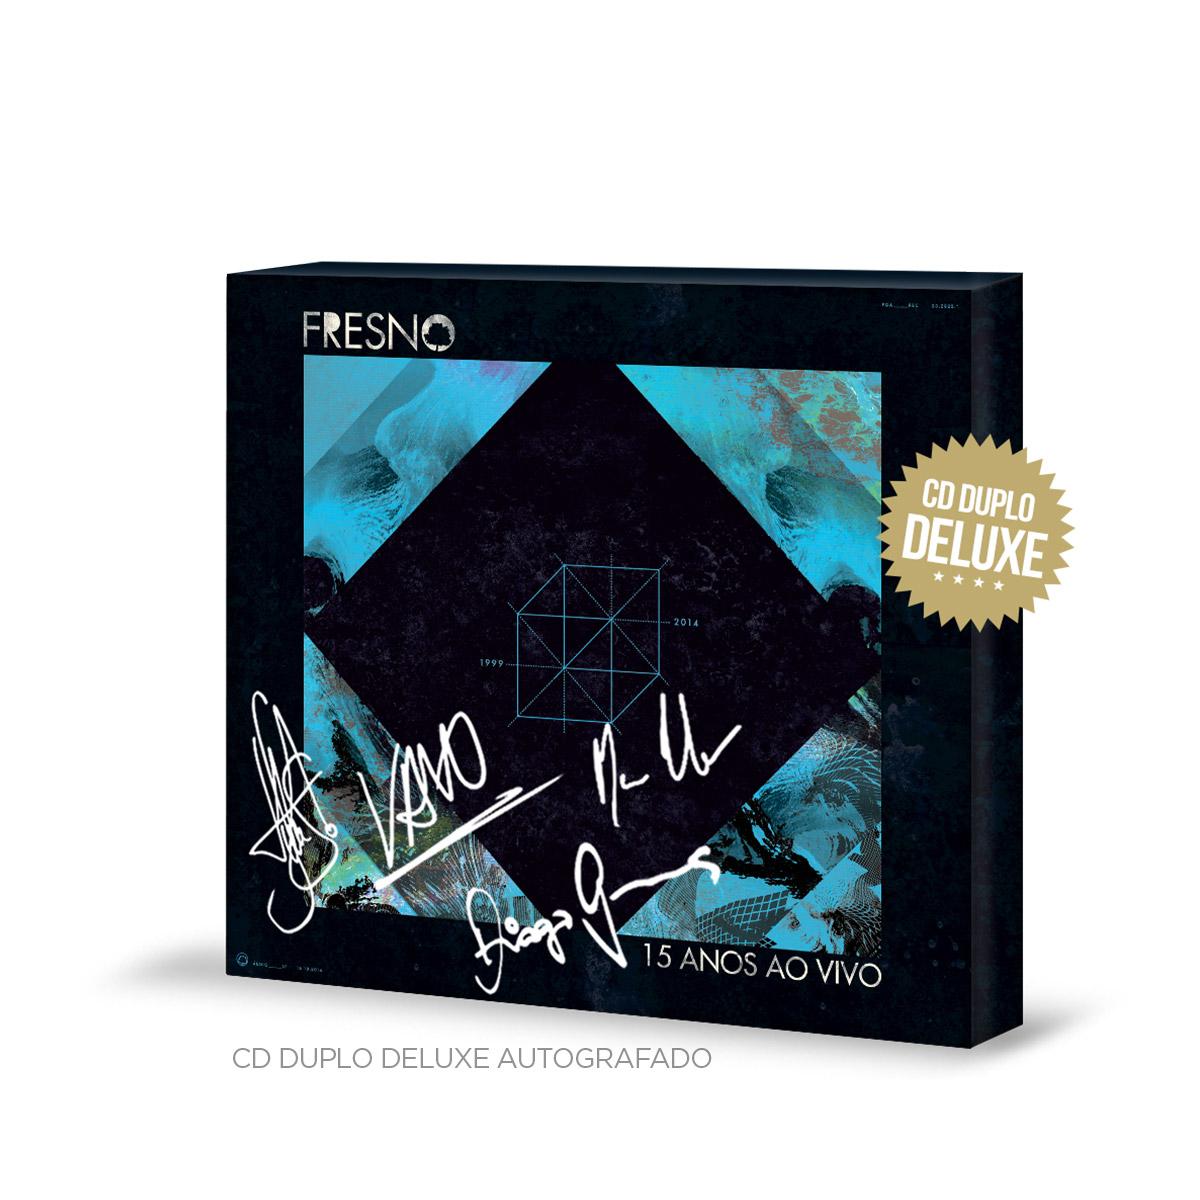 Combo Premium CD Duplo Fresno 15 Anos ao Vivo AUTOGRAFADO + Regata